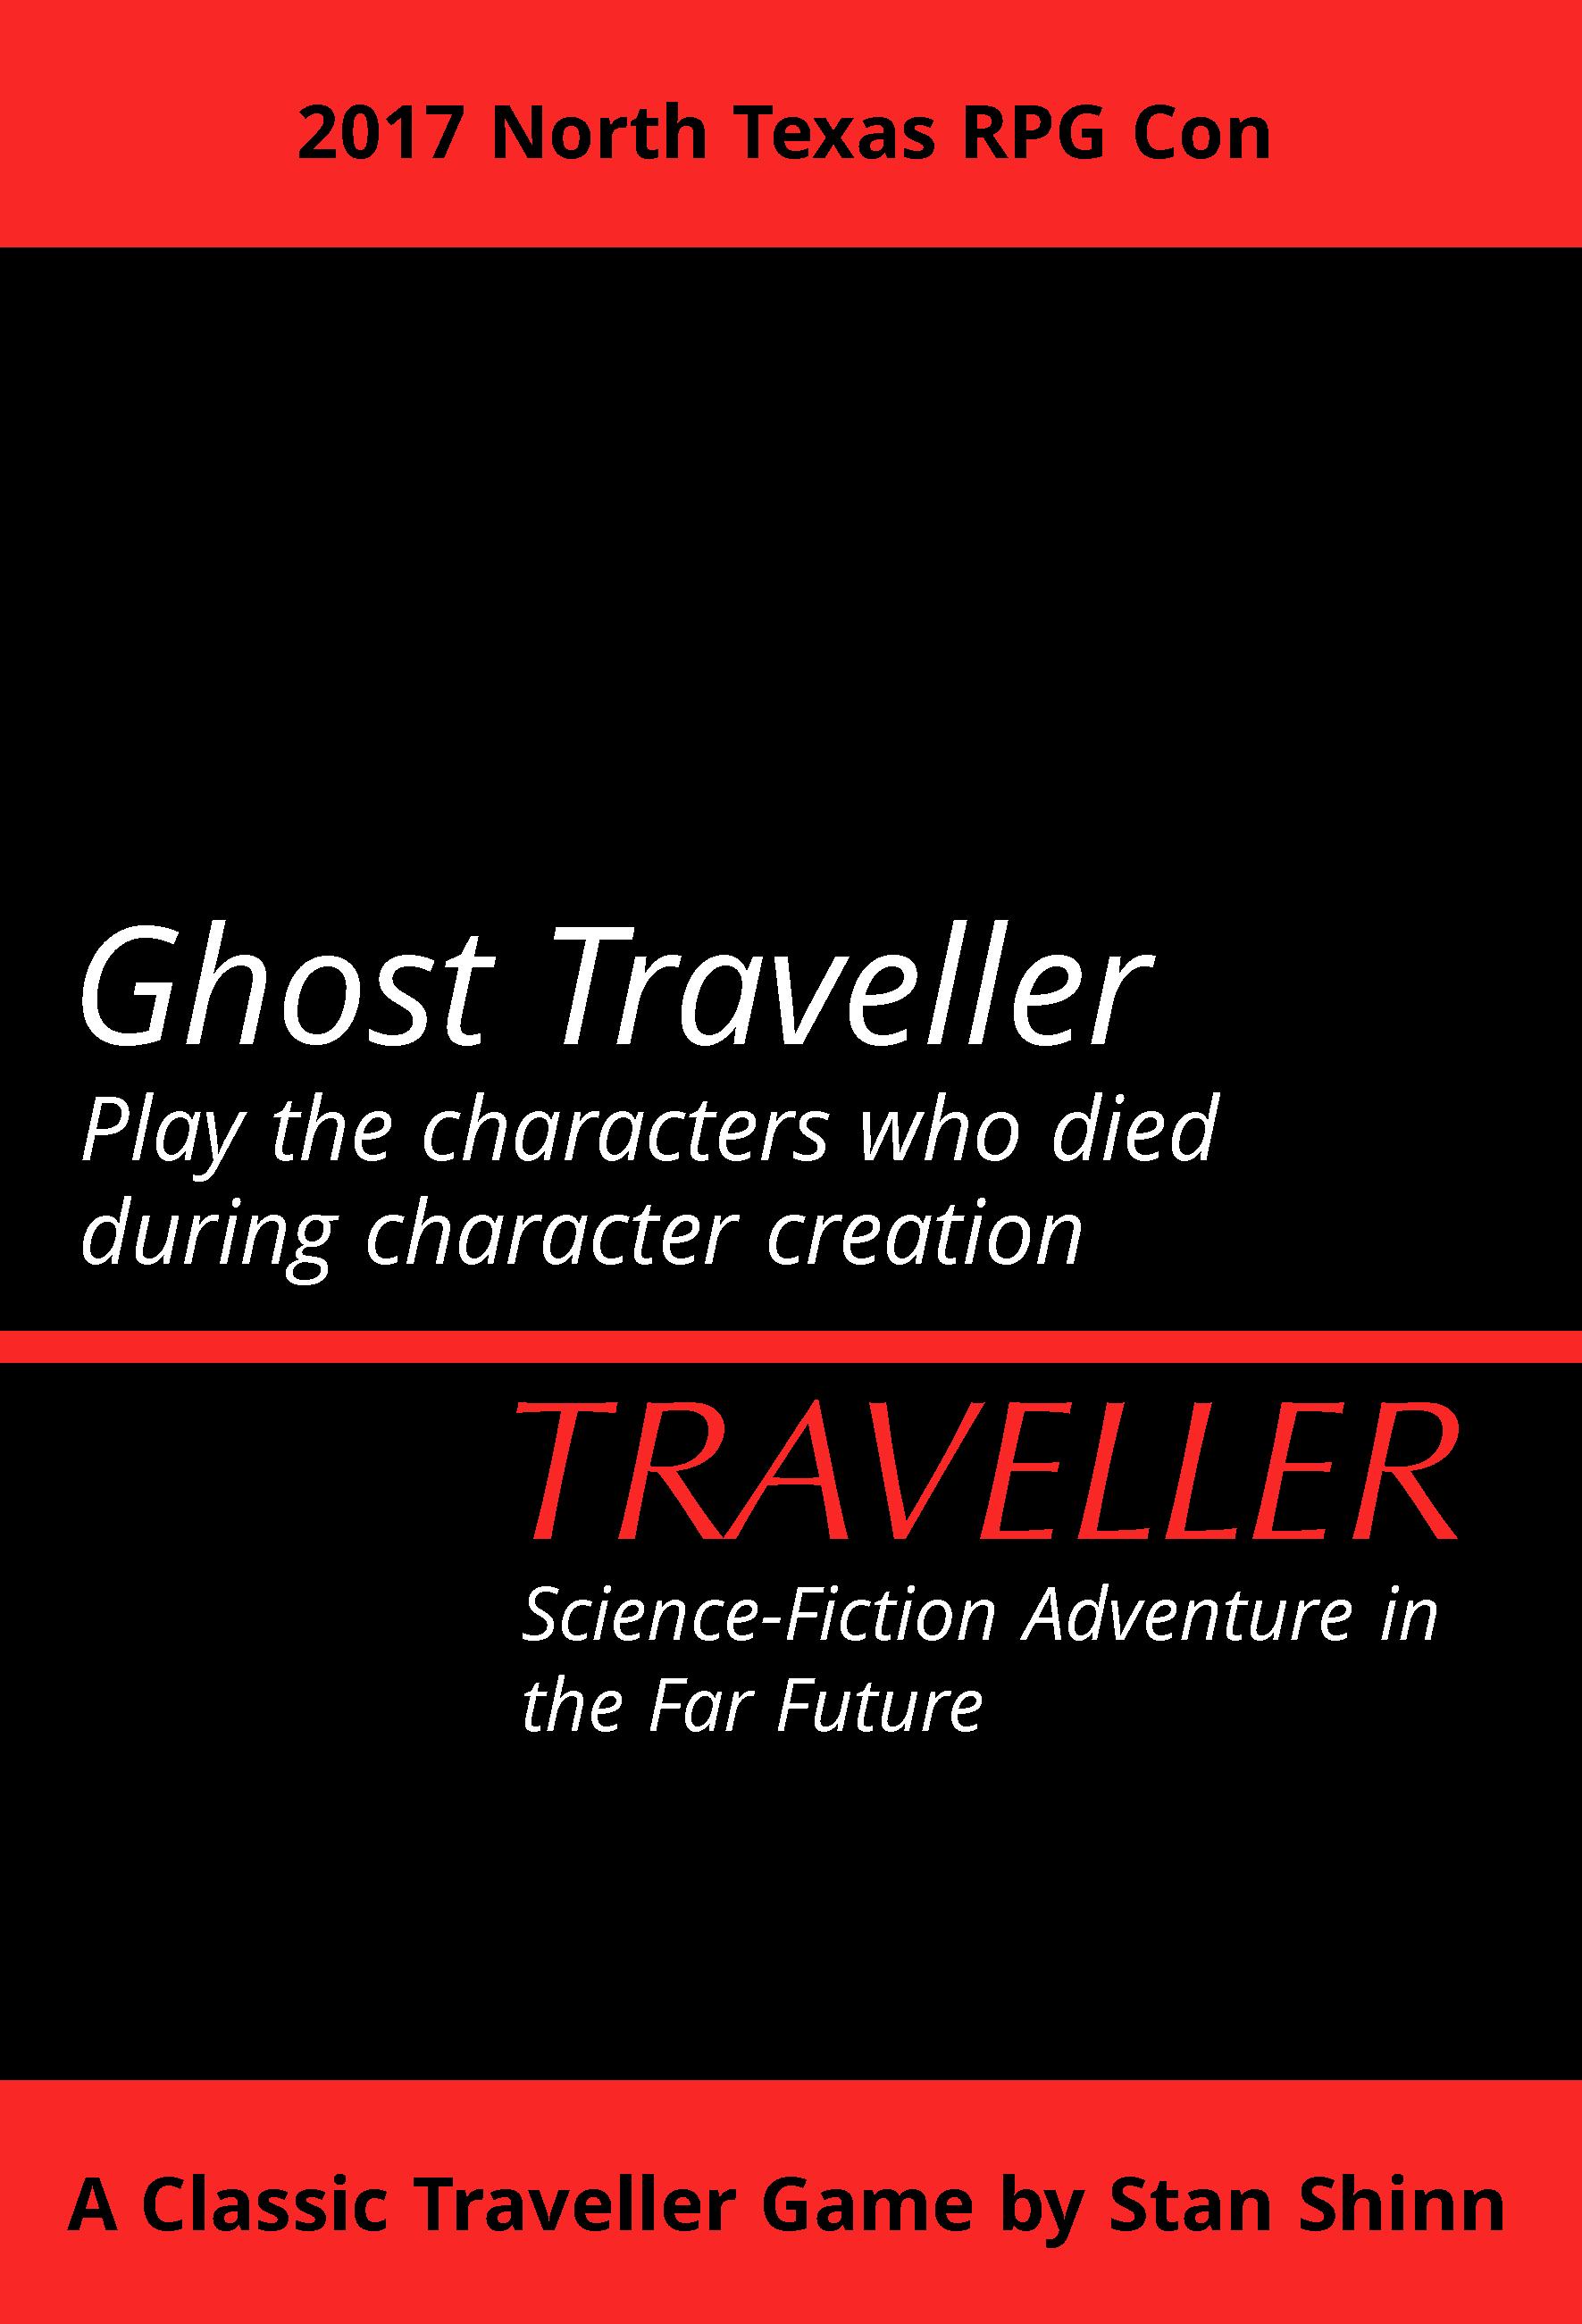 Ghost Traveller NTRPGCon 2017